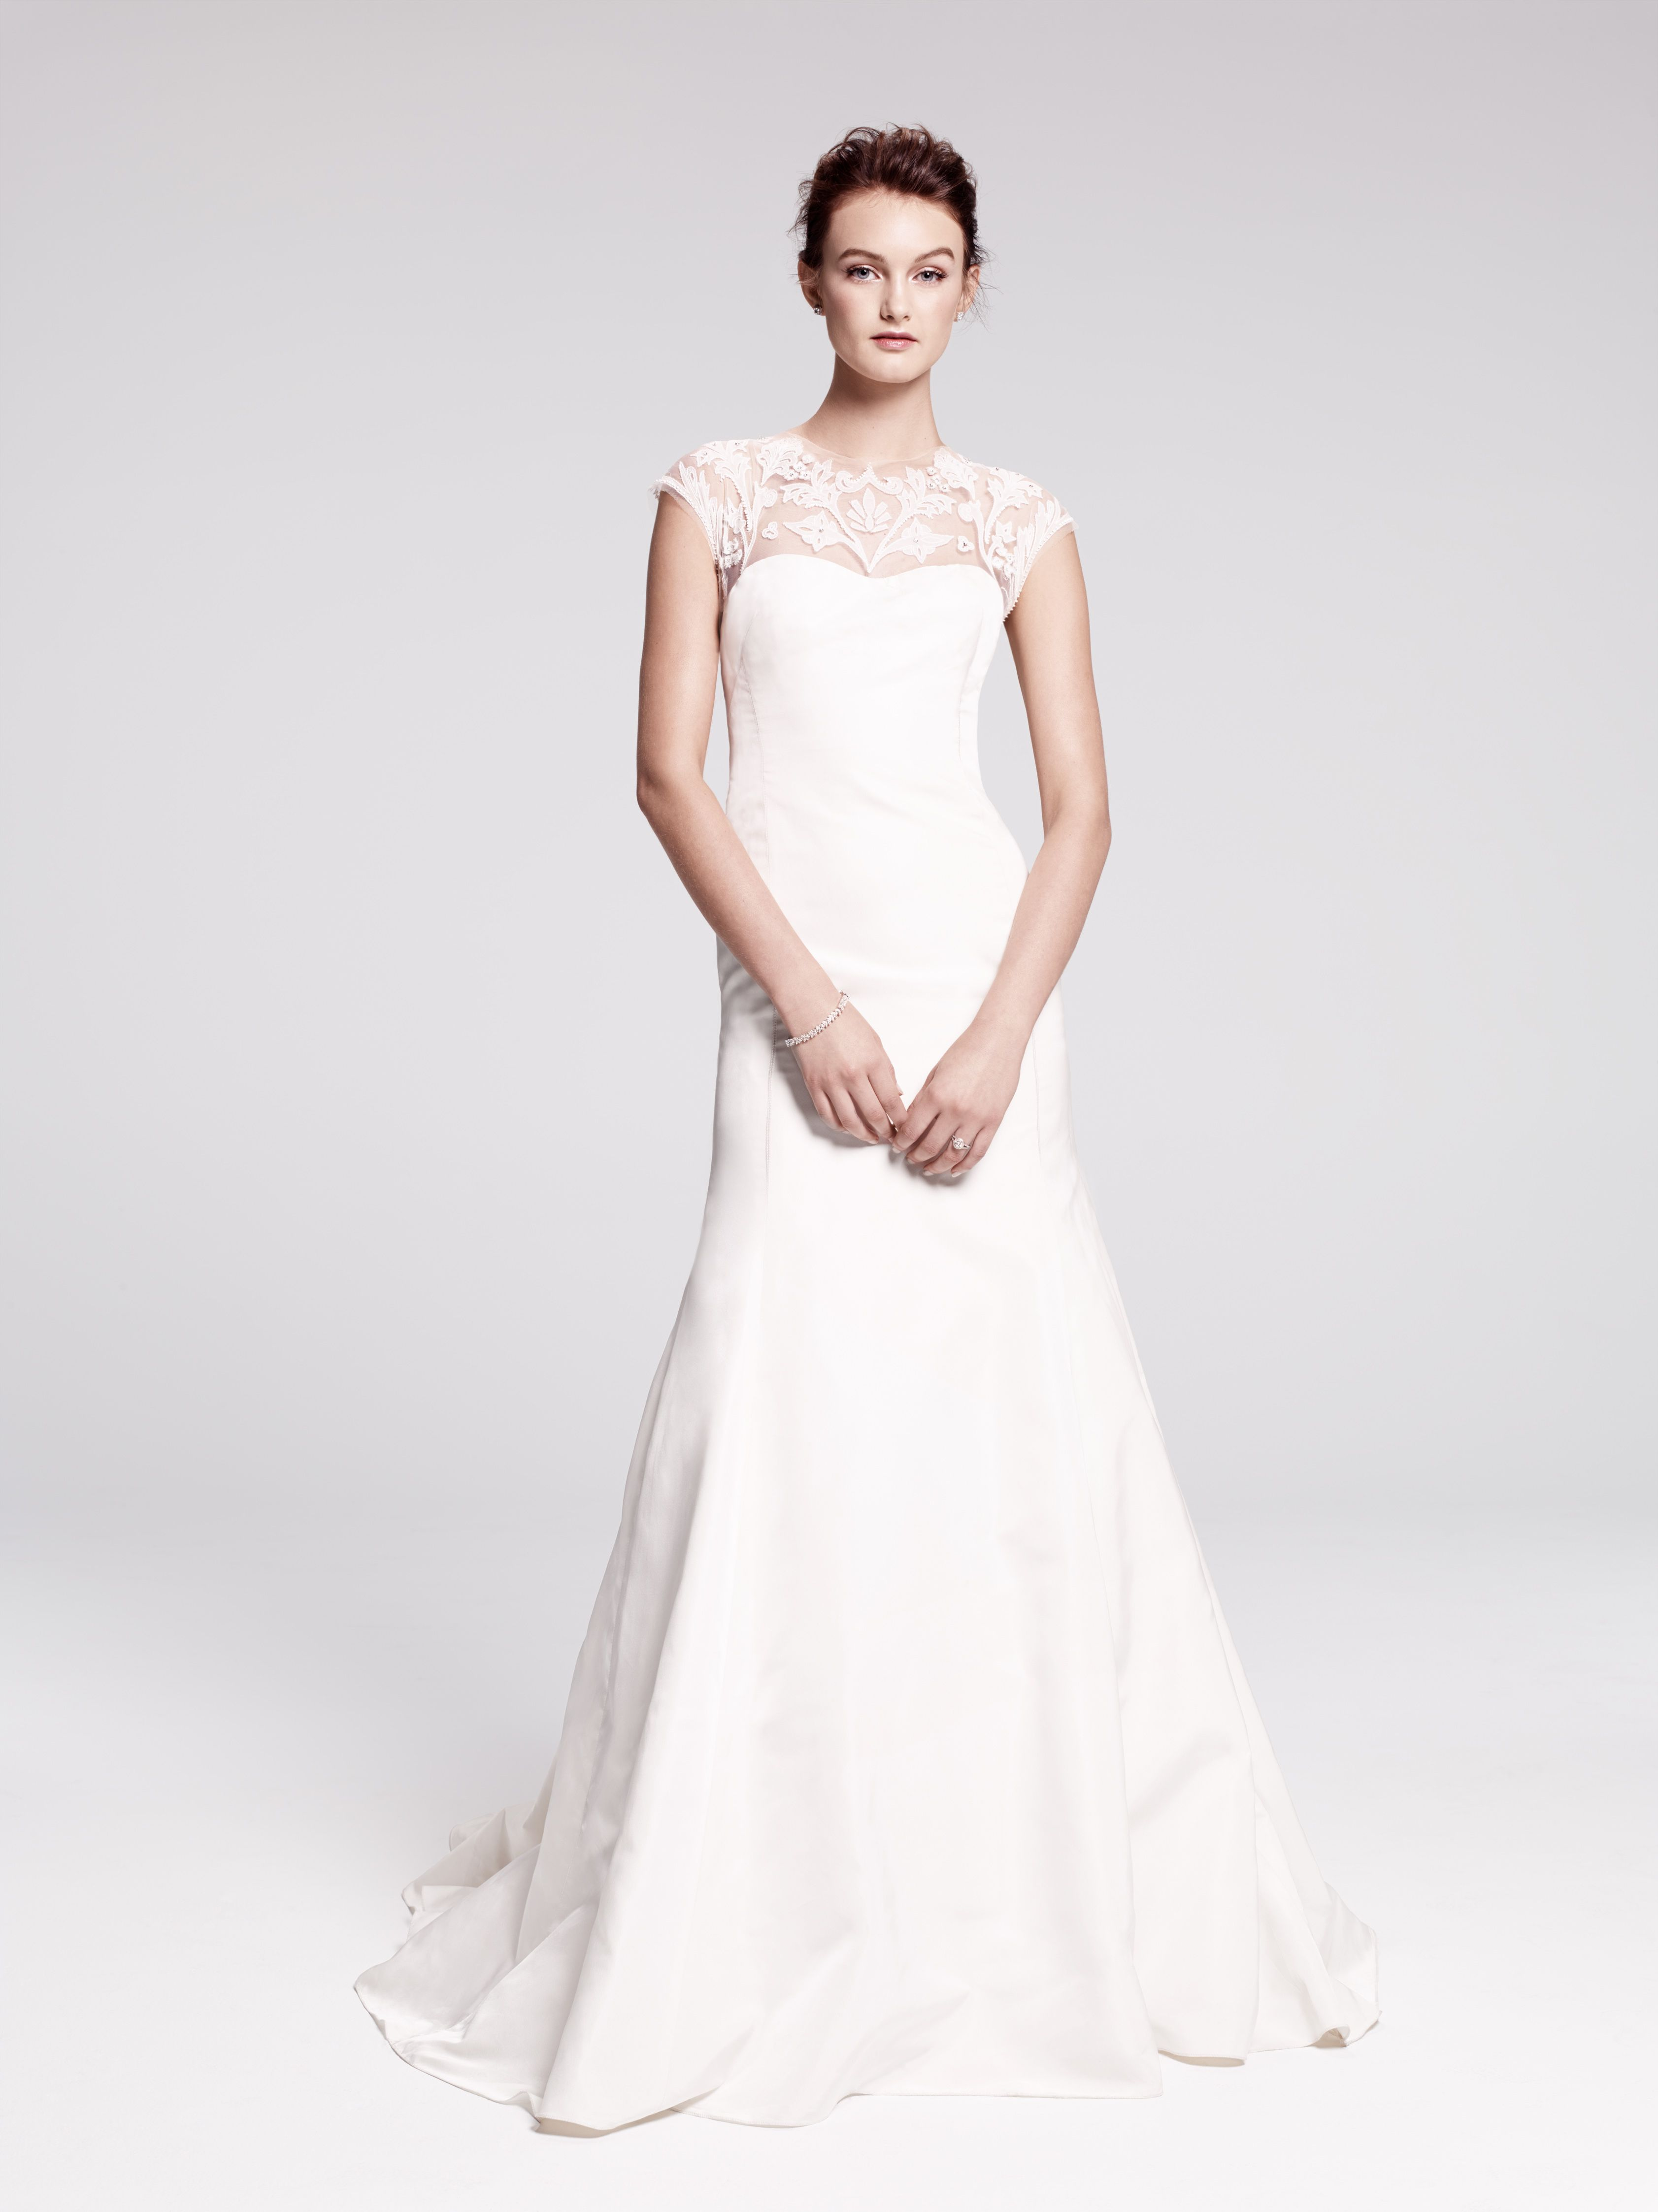 Fall 2013 Wedding Dresses Lookbook Nordstrom Nordstrom Wedding Dresses Wedding Dress Accessories Wedding Gowns